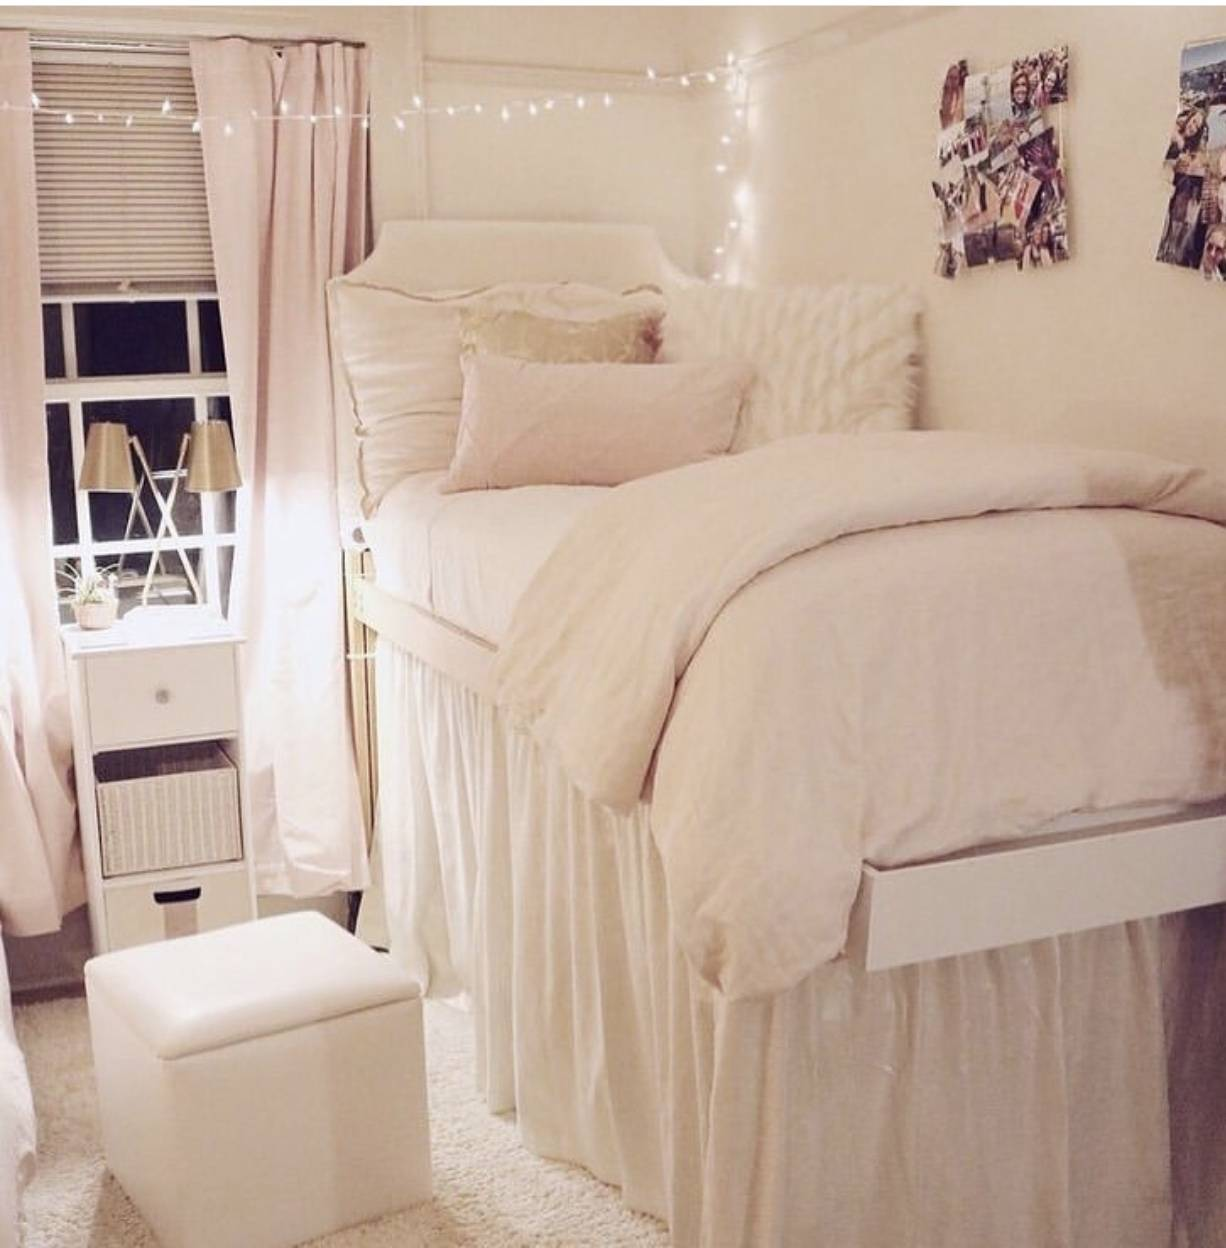 VSCO Room Ideas: How to Create a Cute Dorm Room - The Pink ... on Simple But Cute Room Ideas  id=29124